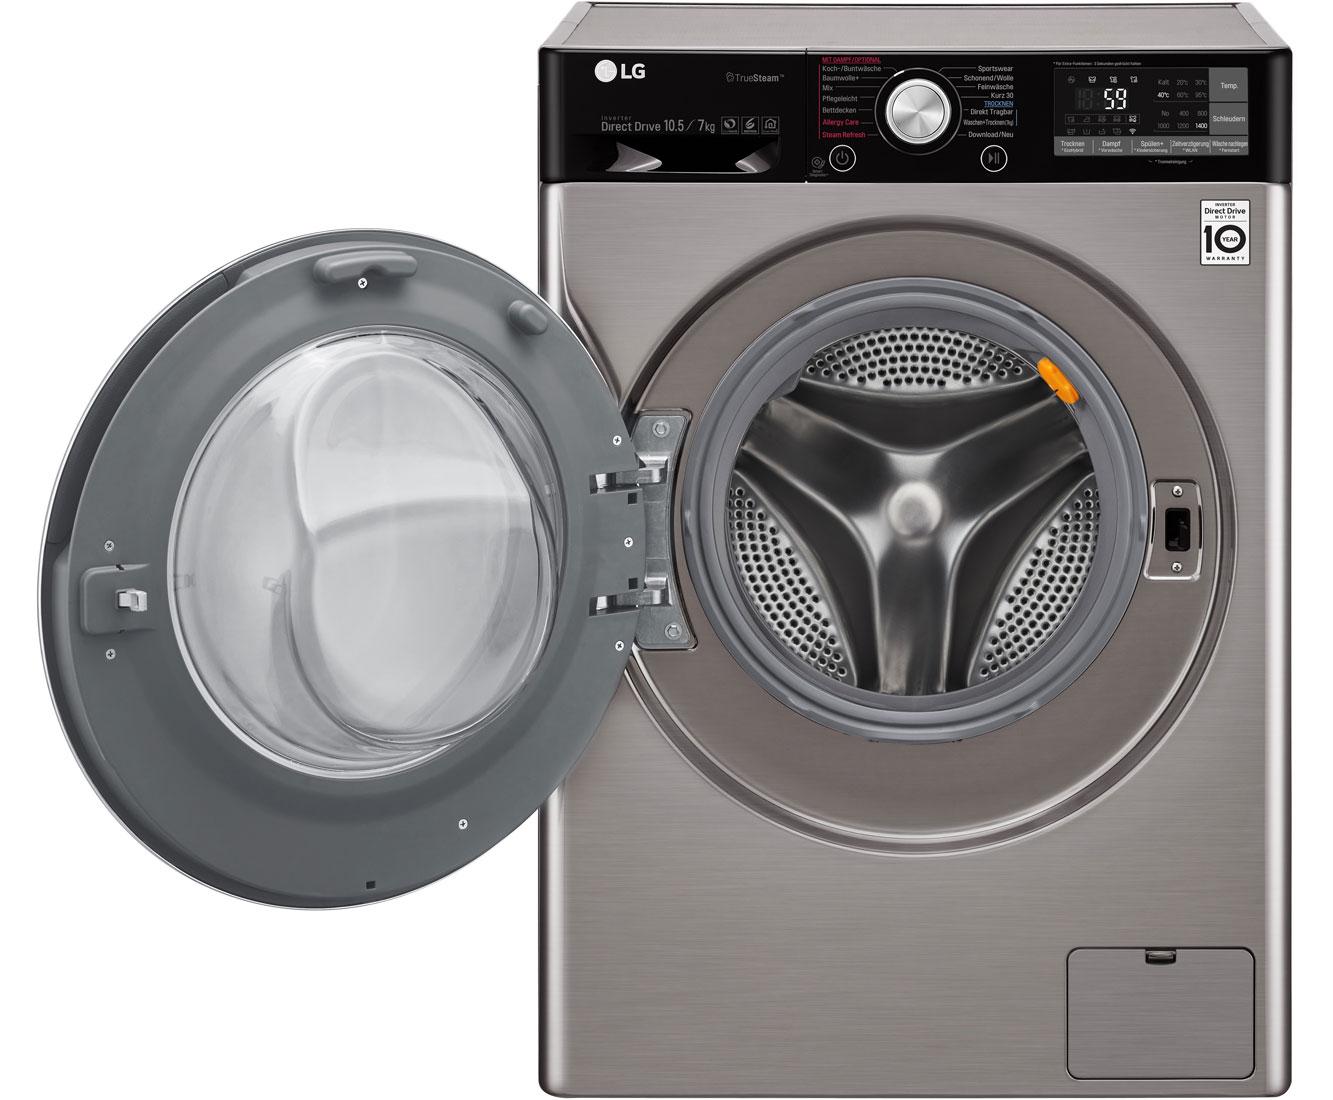 Waschtrockner gebraucht shpock